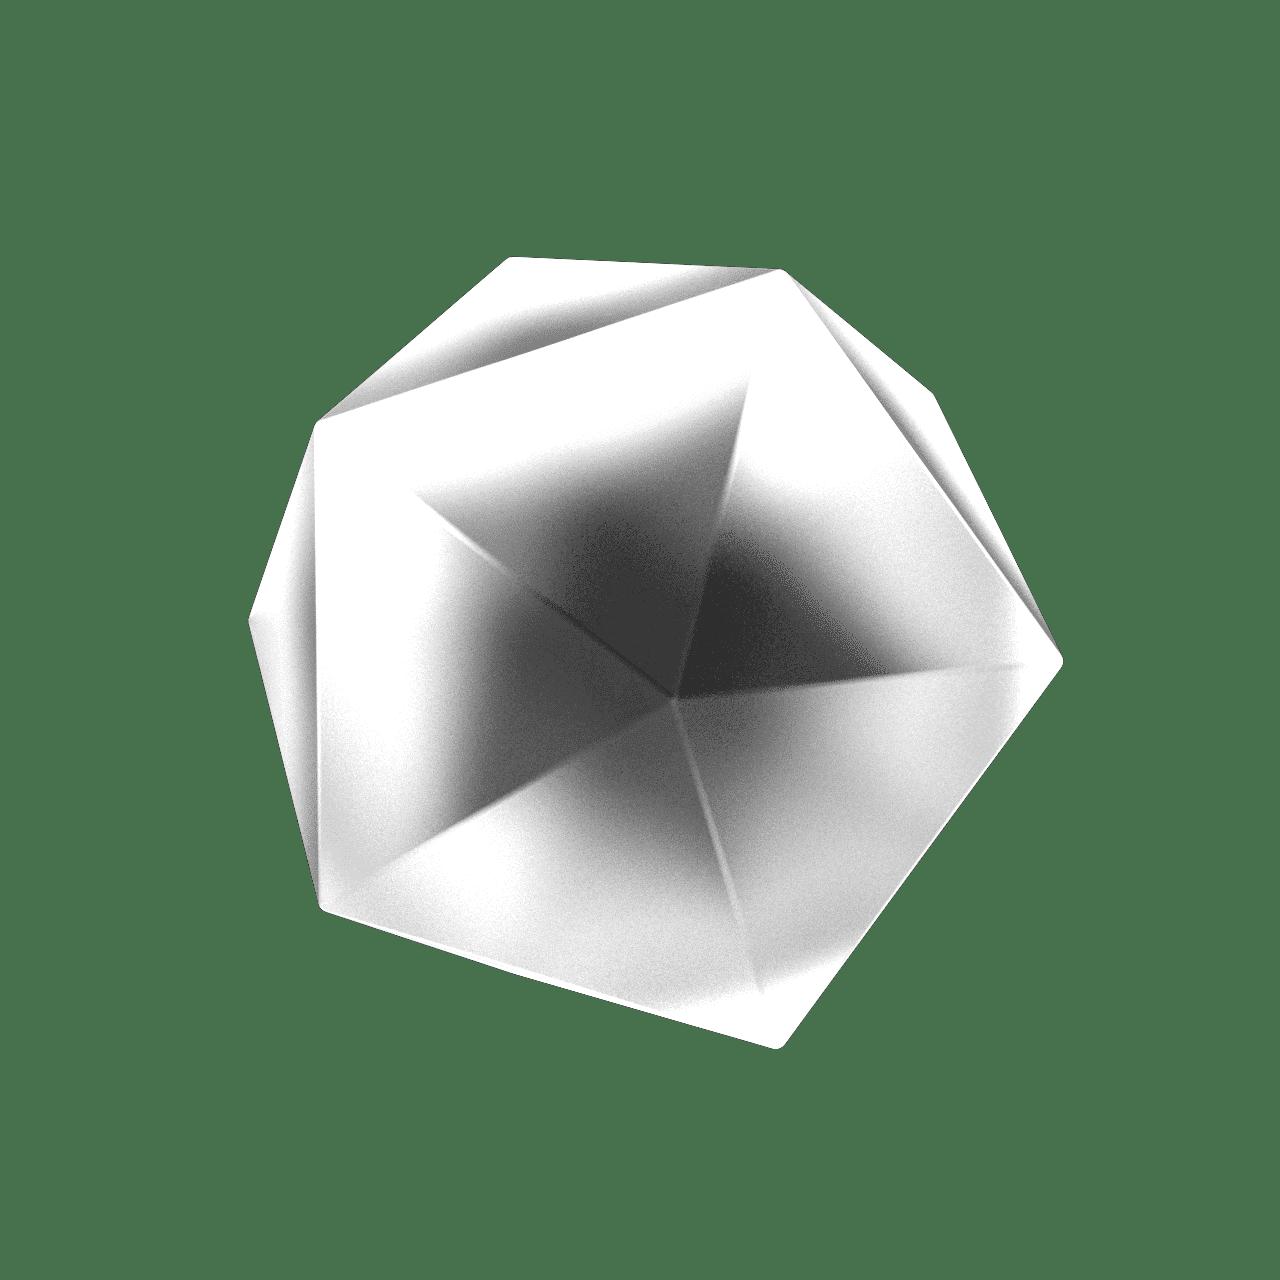 Platonic_3_-_Icosa0003-1